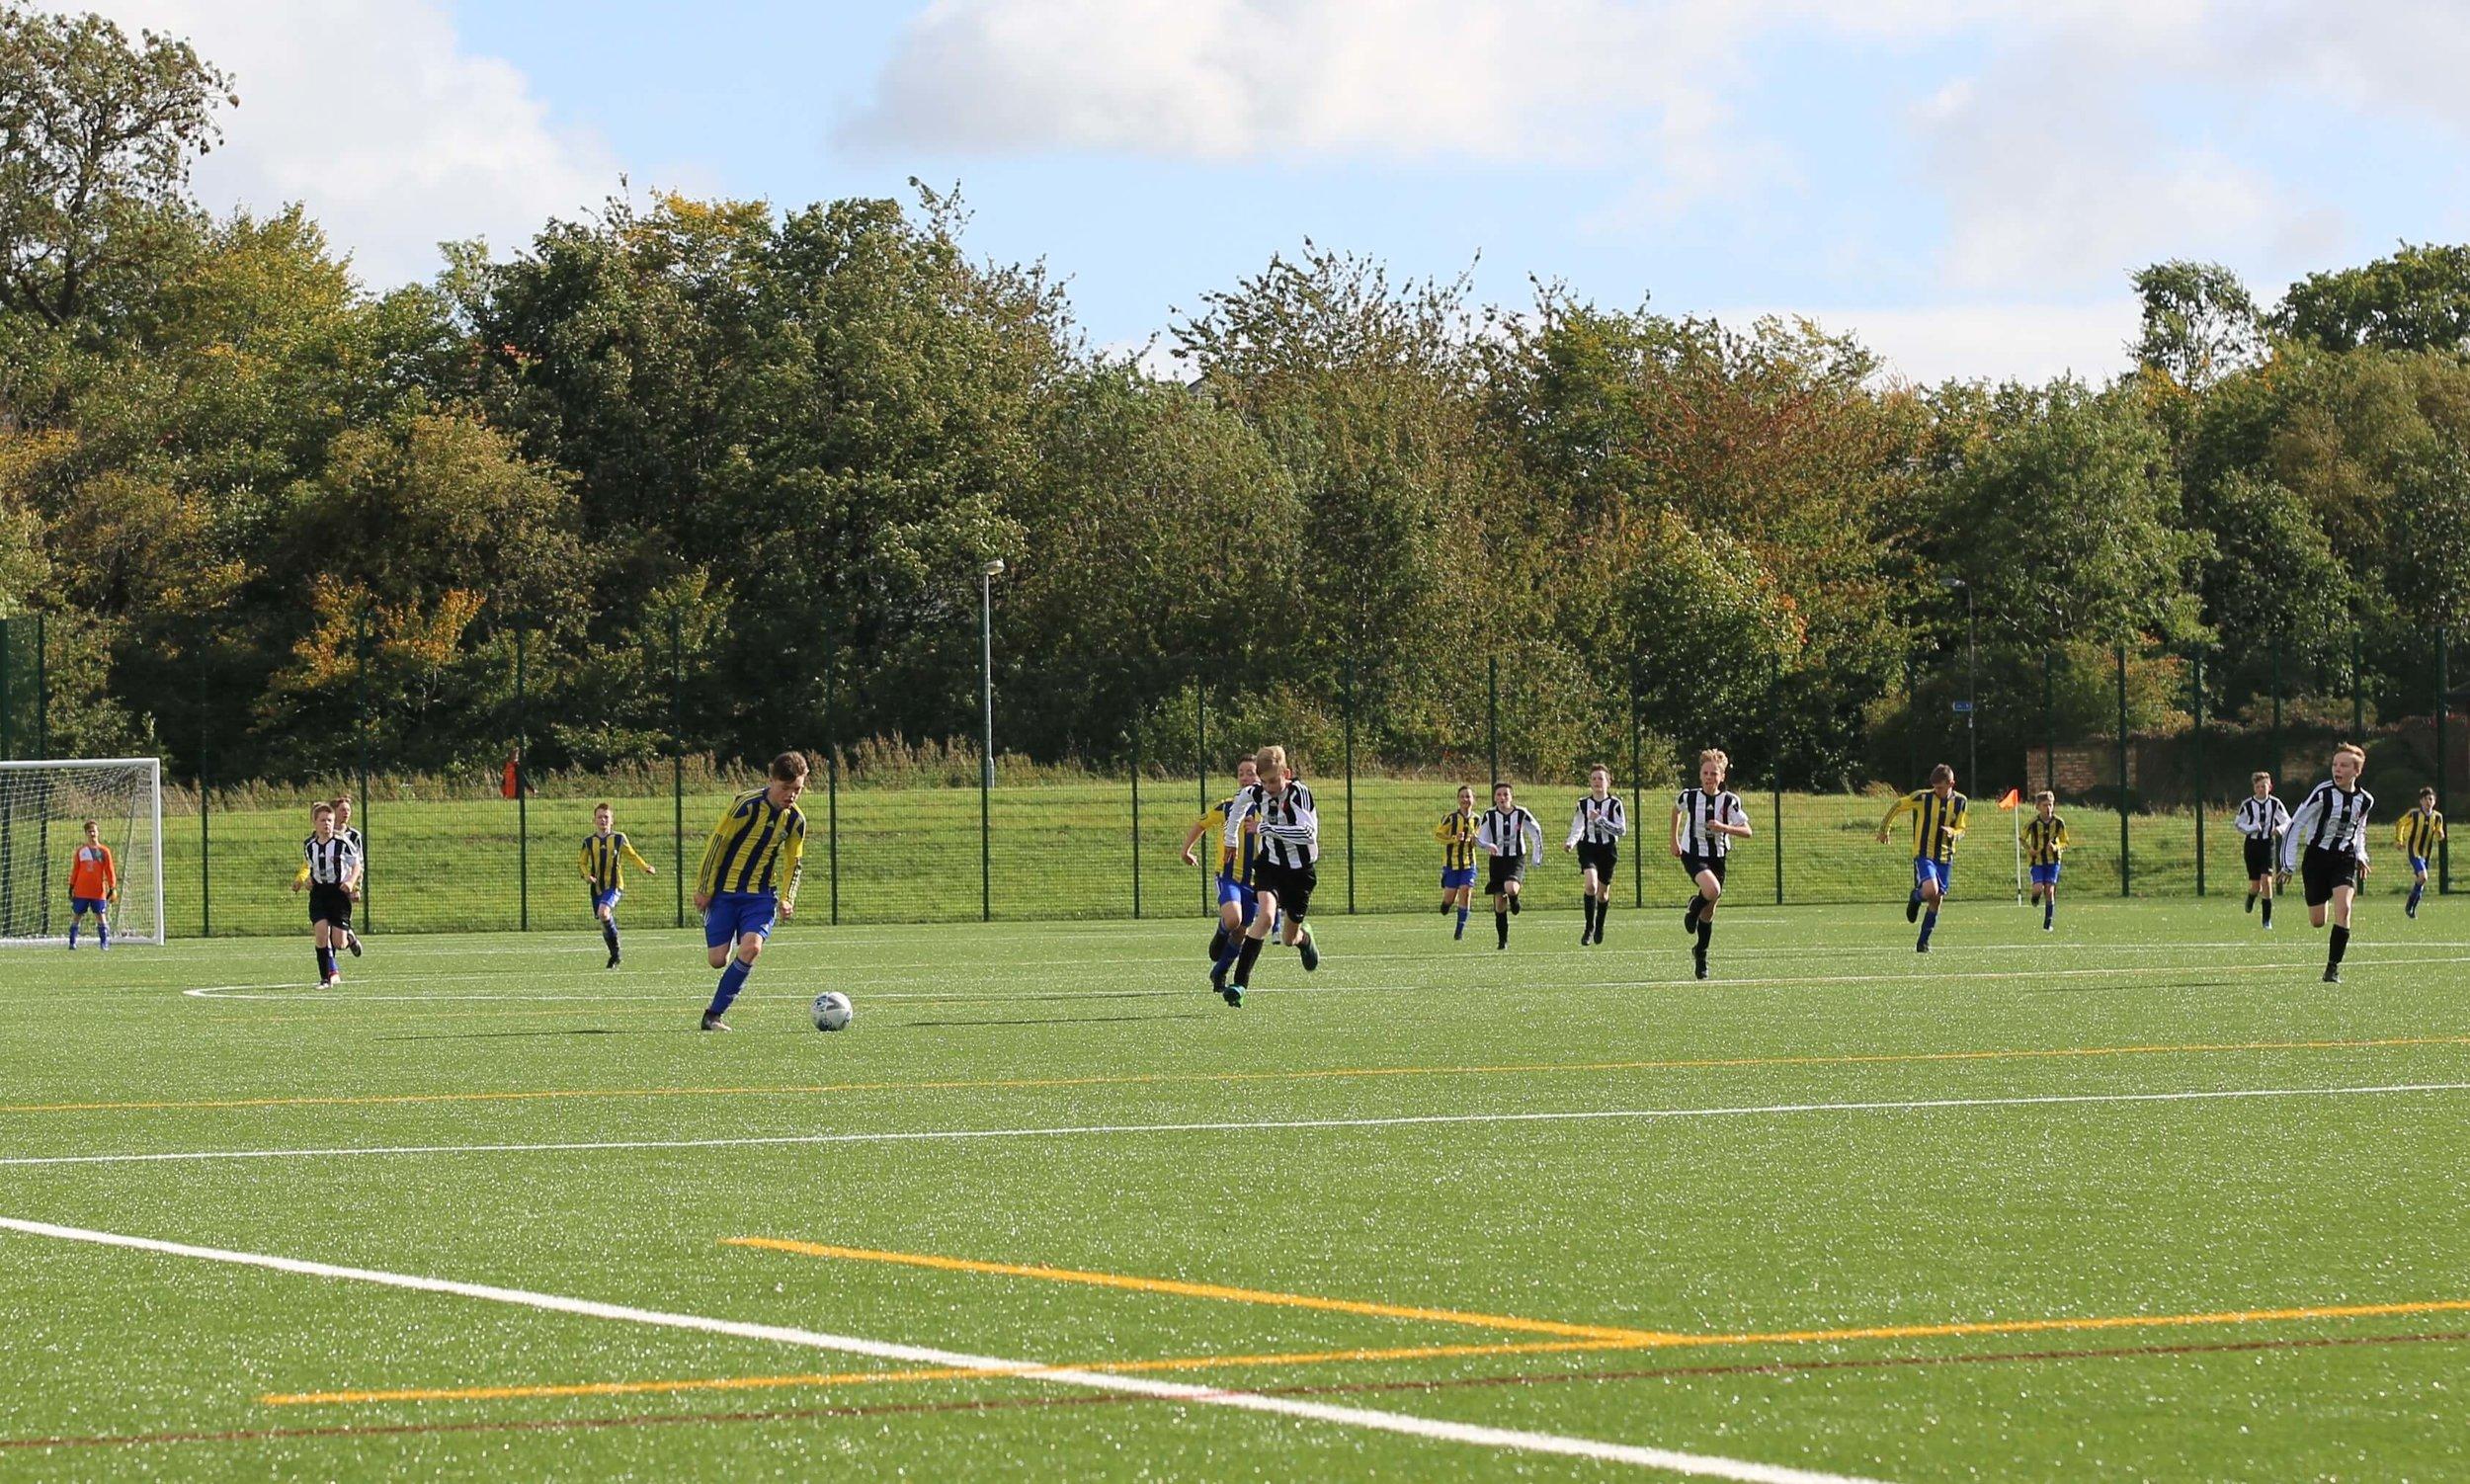 Queensferry Hub Football Pitch.jpg